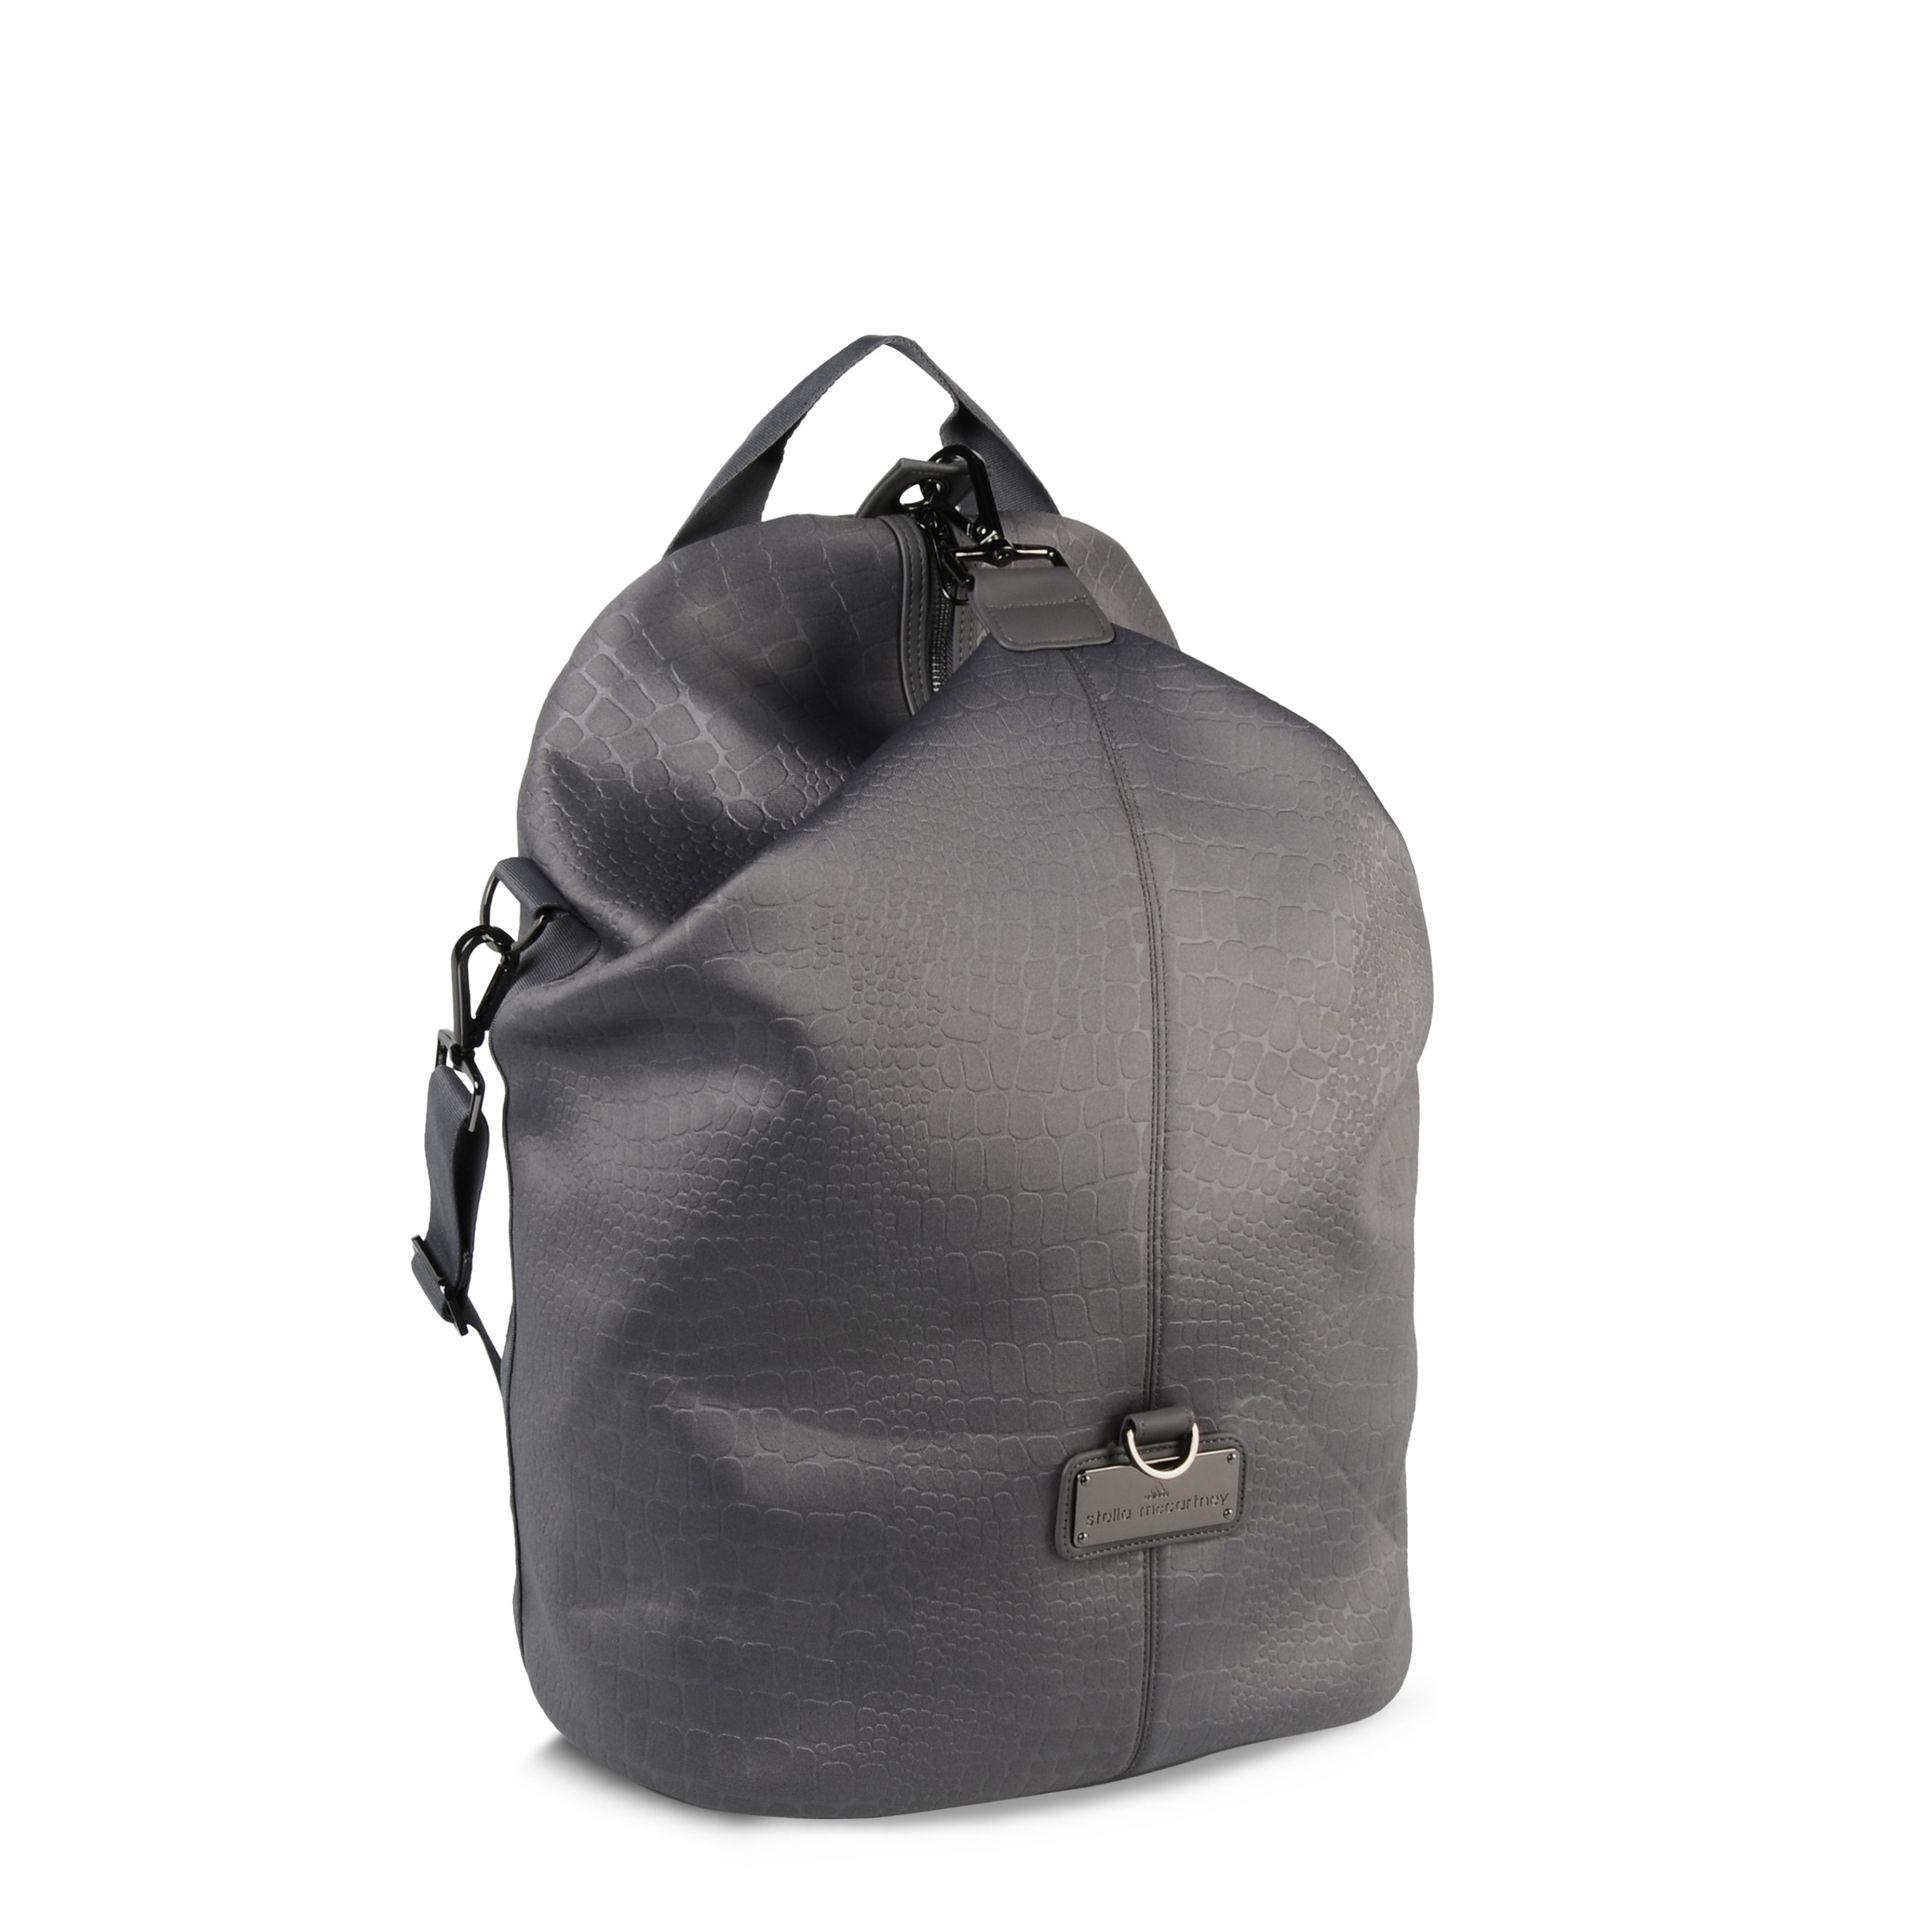 lyst adidas by stella mccartney grey studio bag in gray. Black Bedroom Furniture Sets. Home Design Ideas